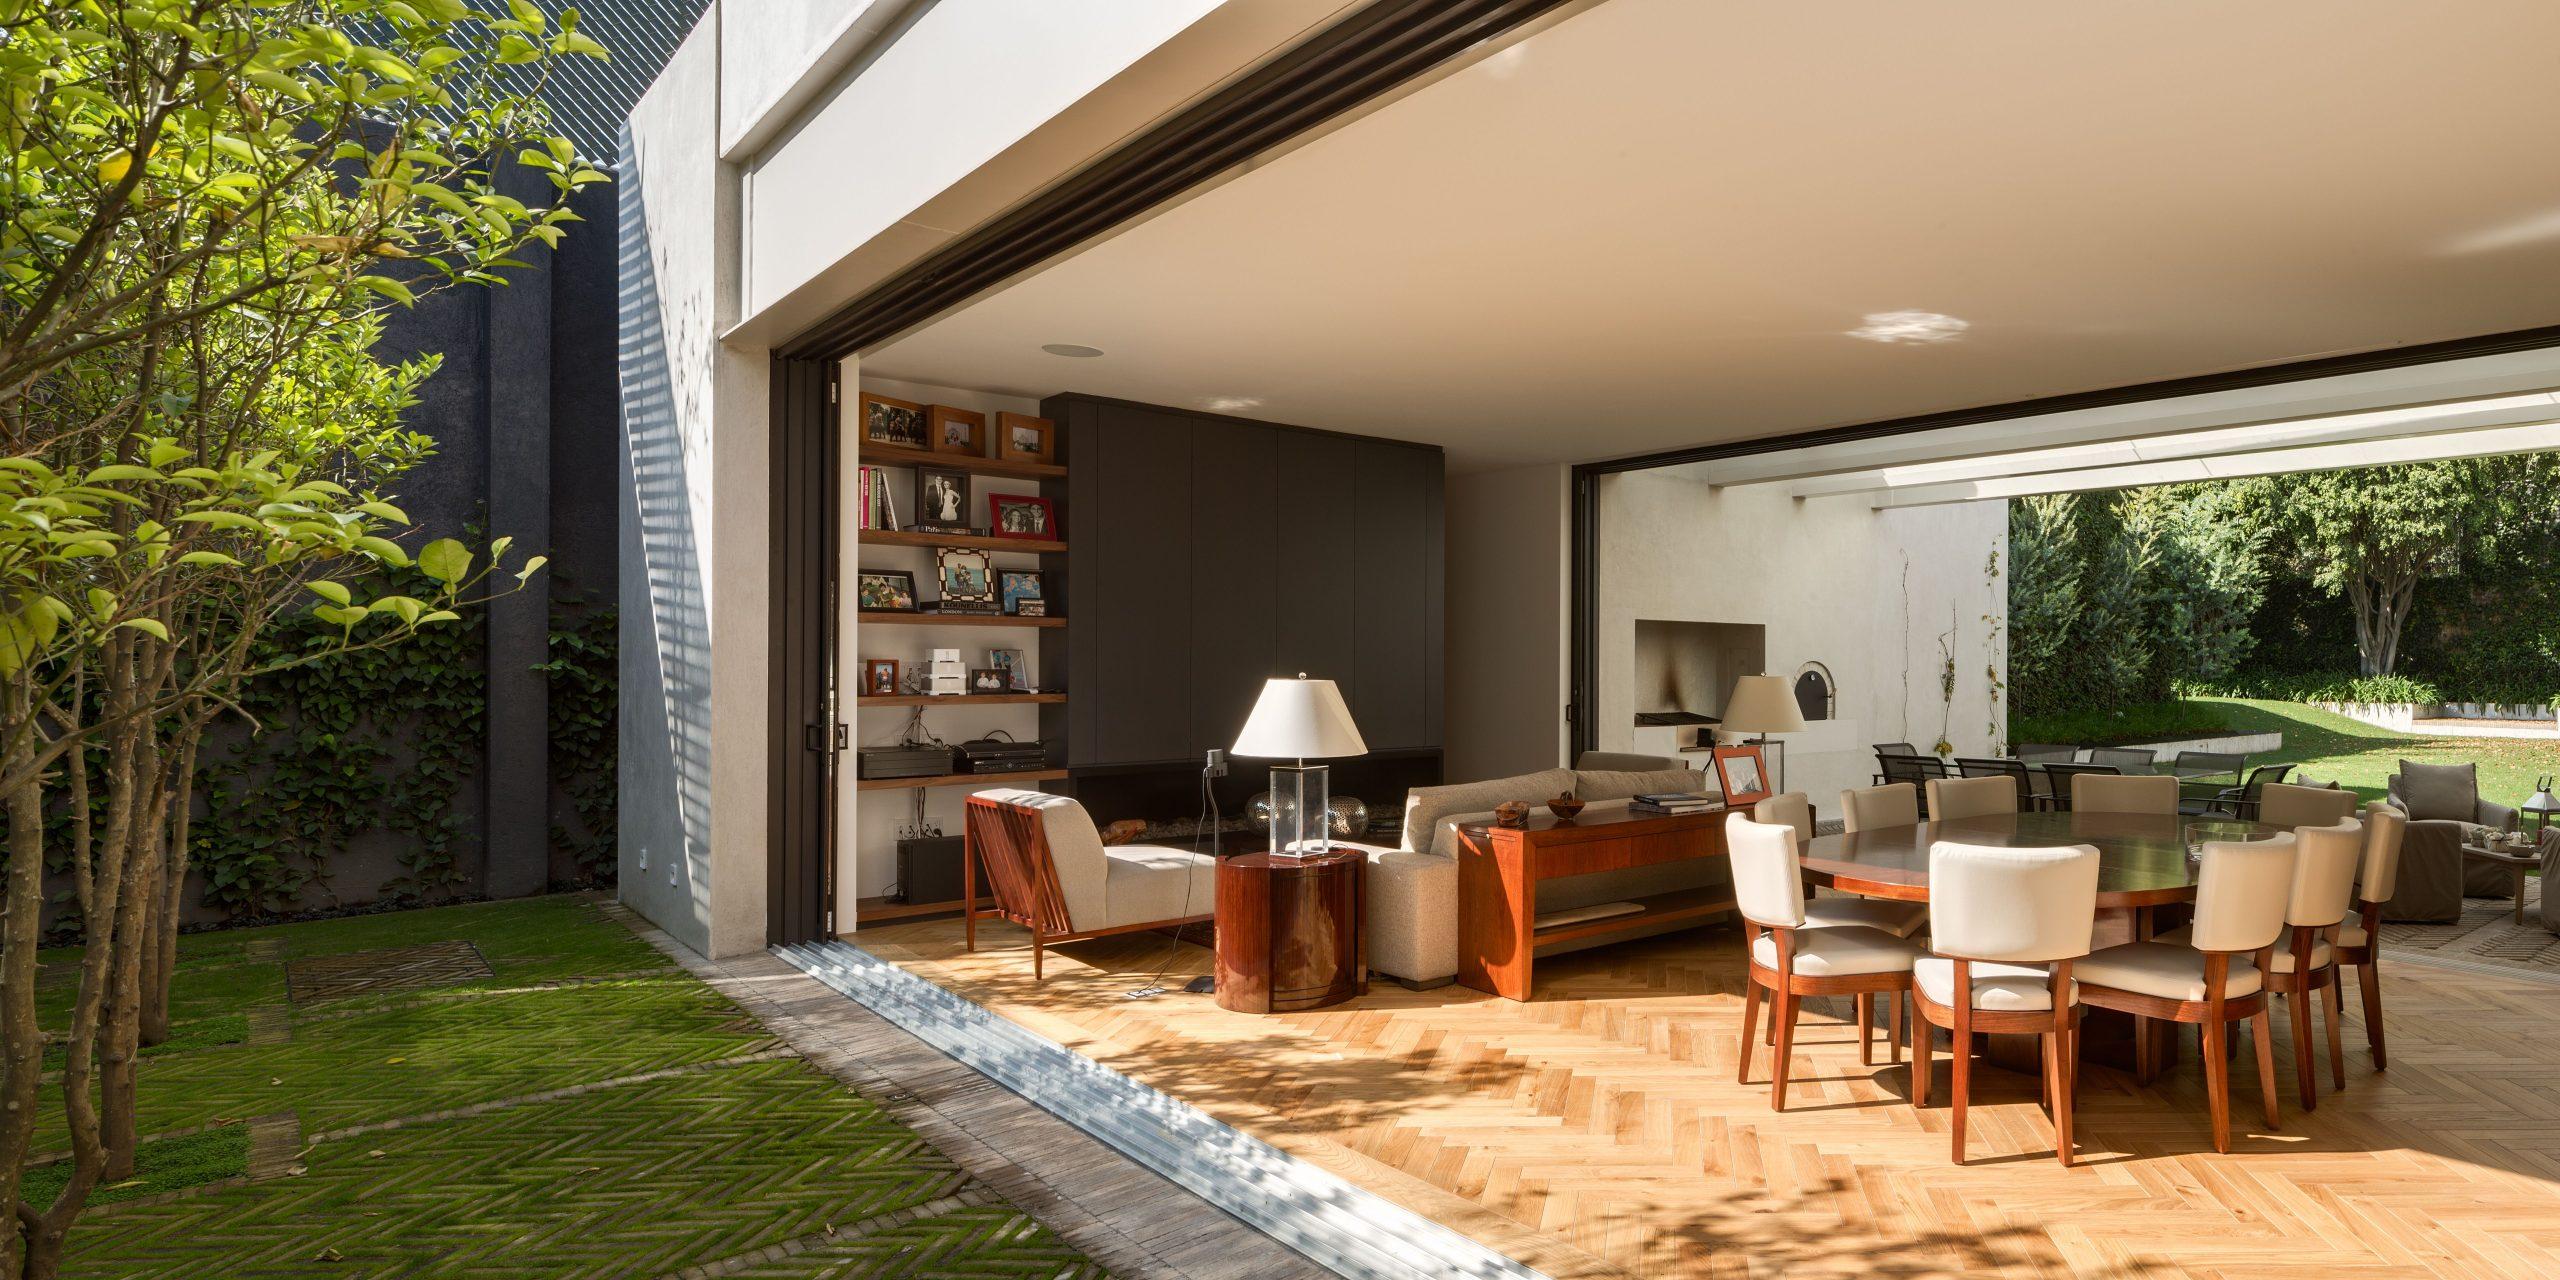 Casa Jardín 58 By Dcpp | Home, Garden, Modern Bungalow, Home avec Bungalow De Jardin Design